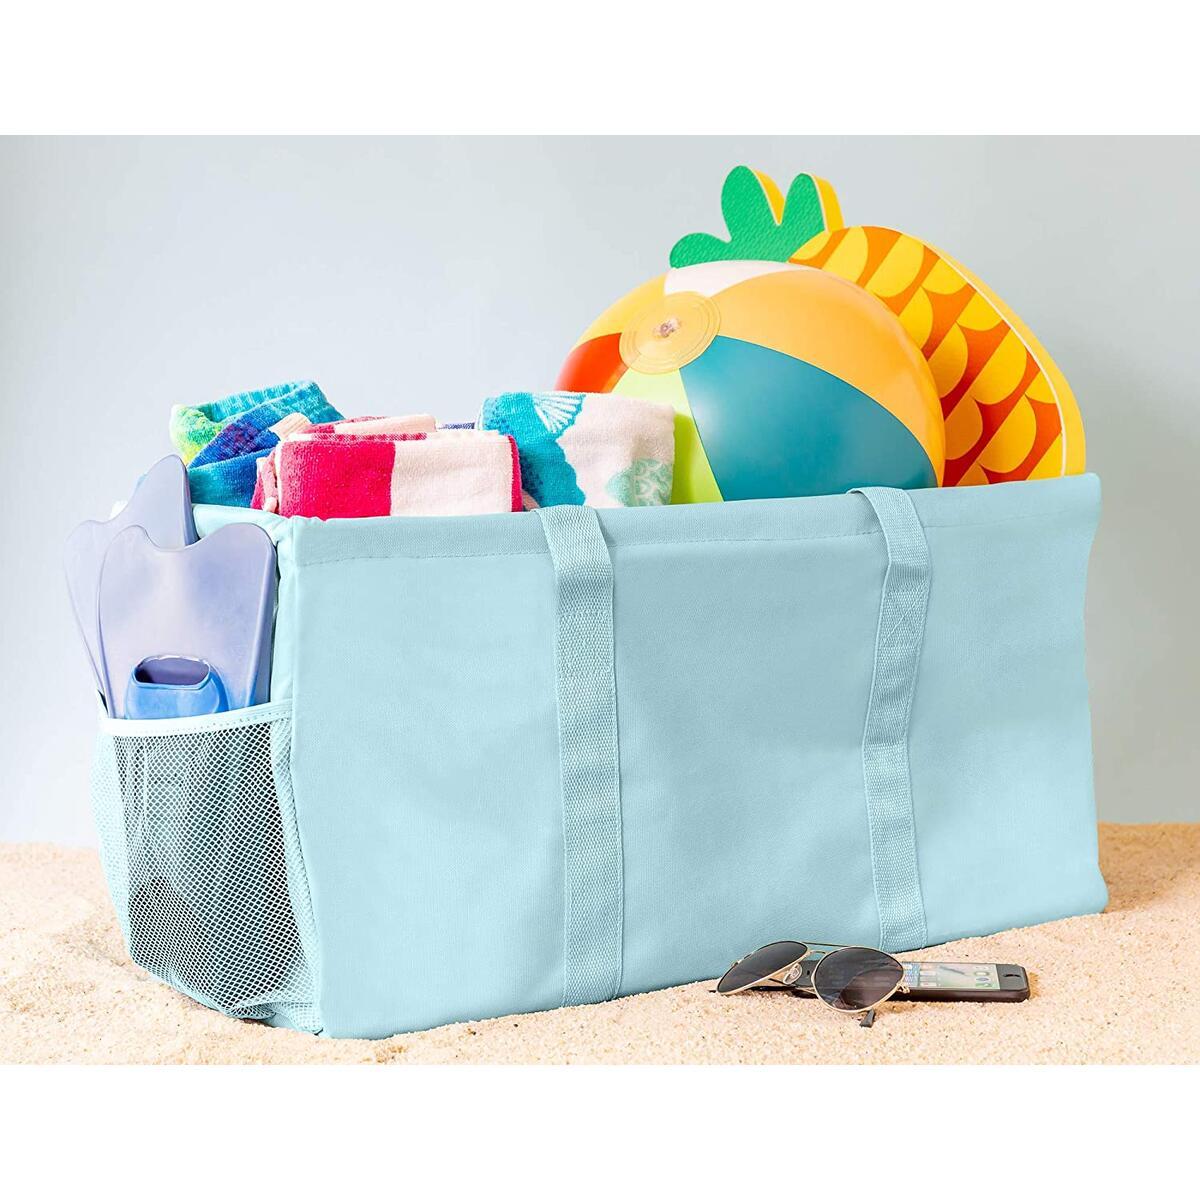 Extra Large Utility Tote Bag - Light Blue